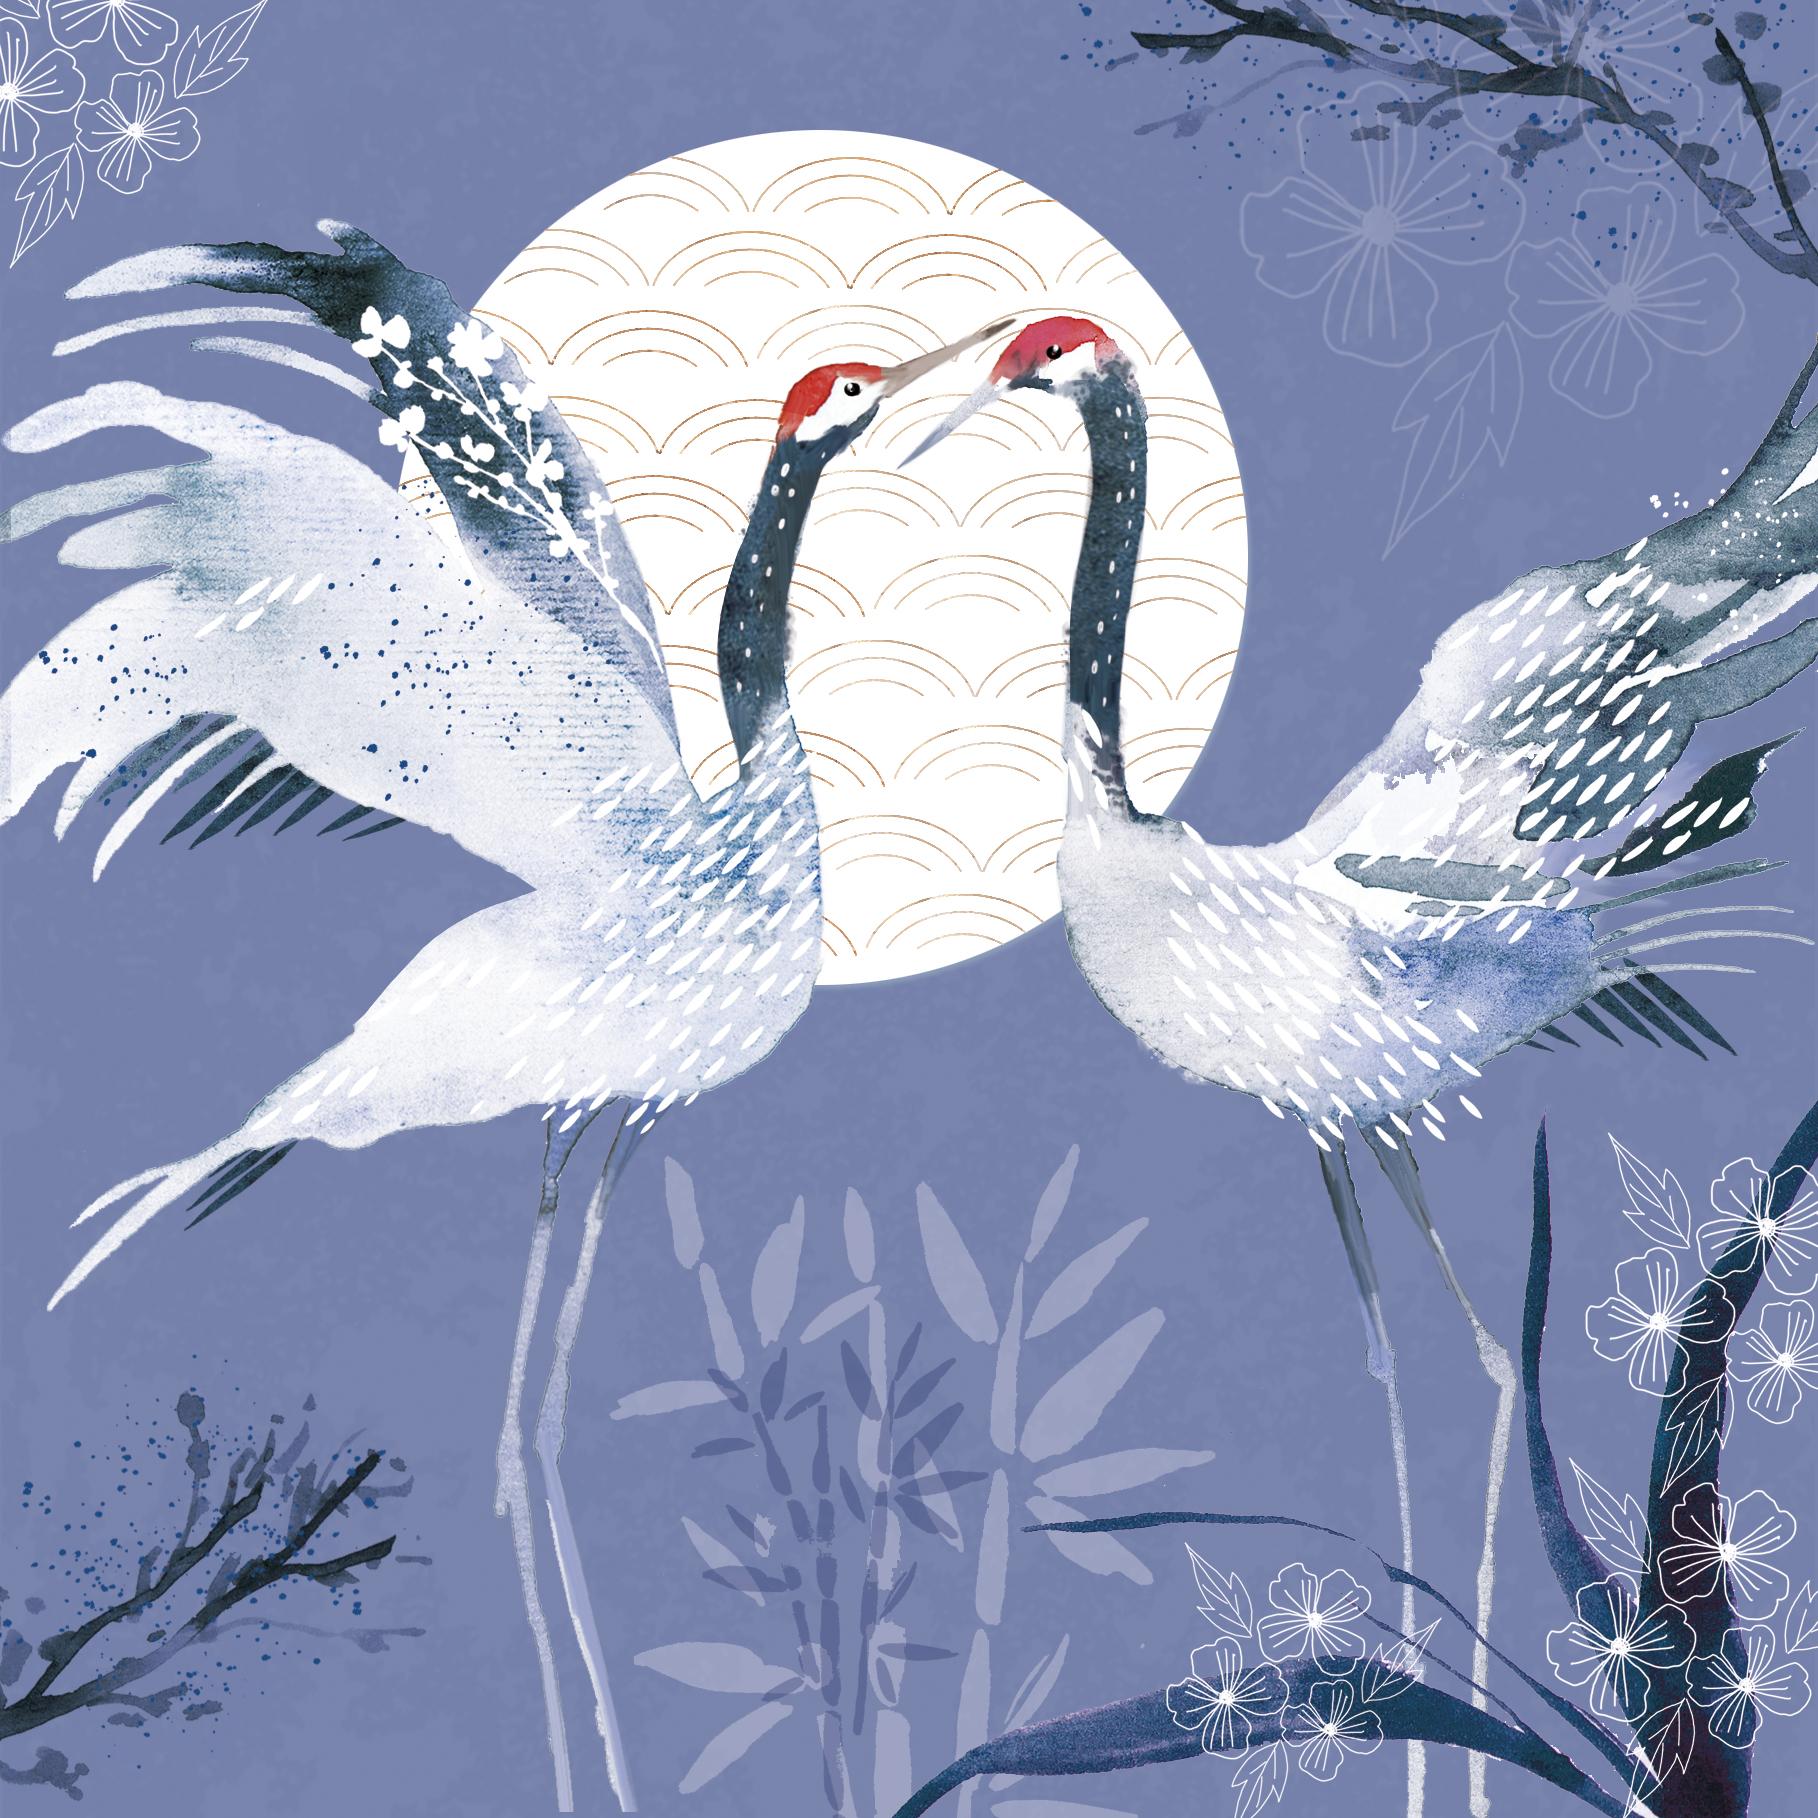 Above: Sam Neville's cranes/Sanja Rescek cranes or embellished bird artwork reminiscent of Kimono prints, courtesy of The Bright Agency.